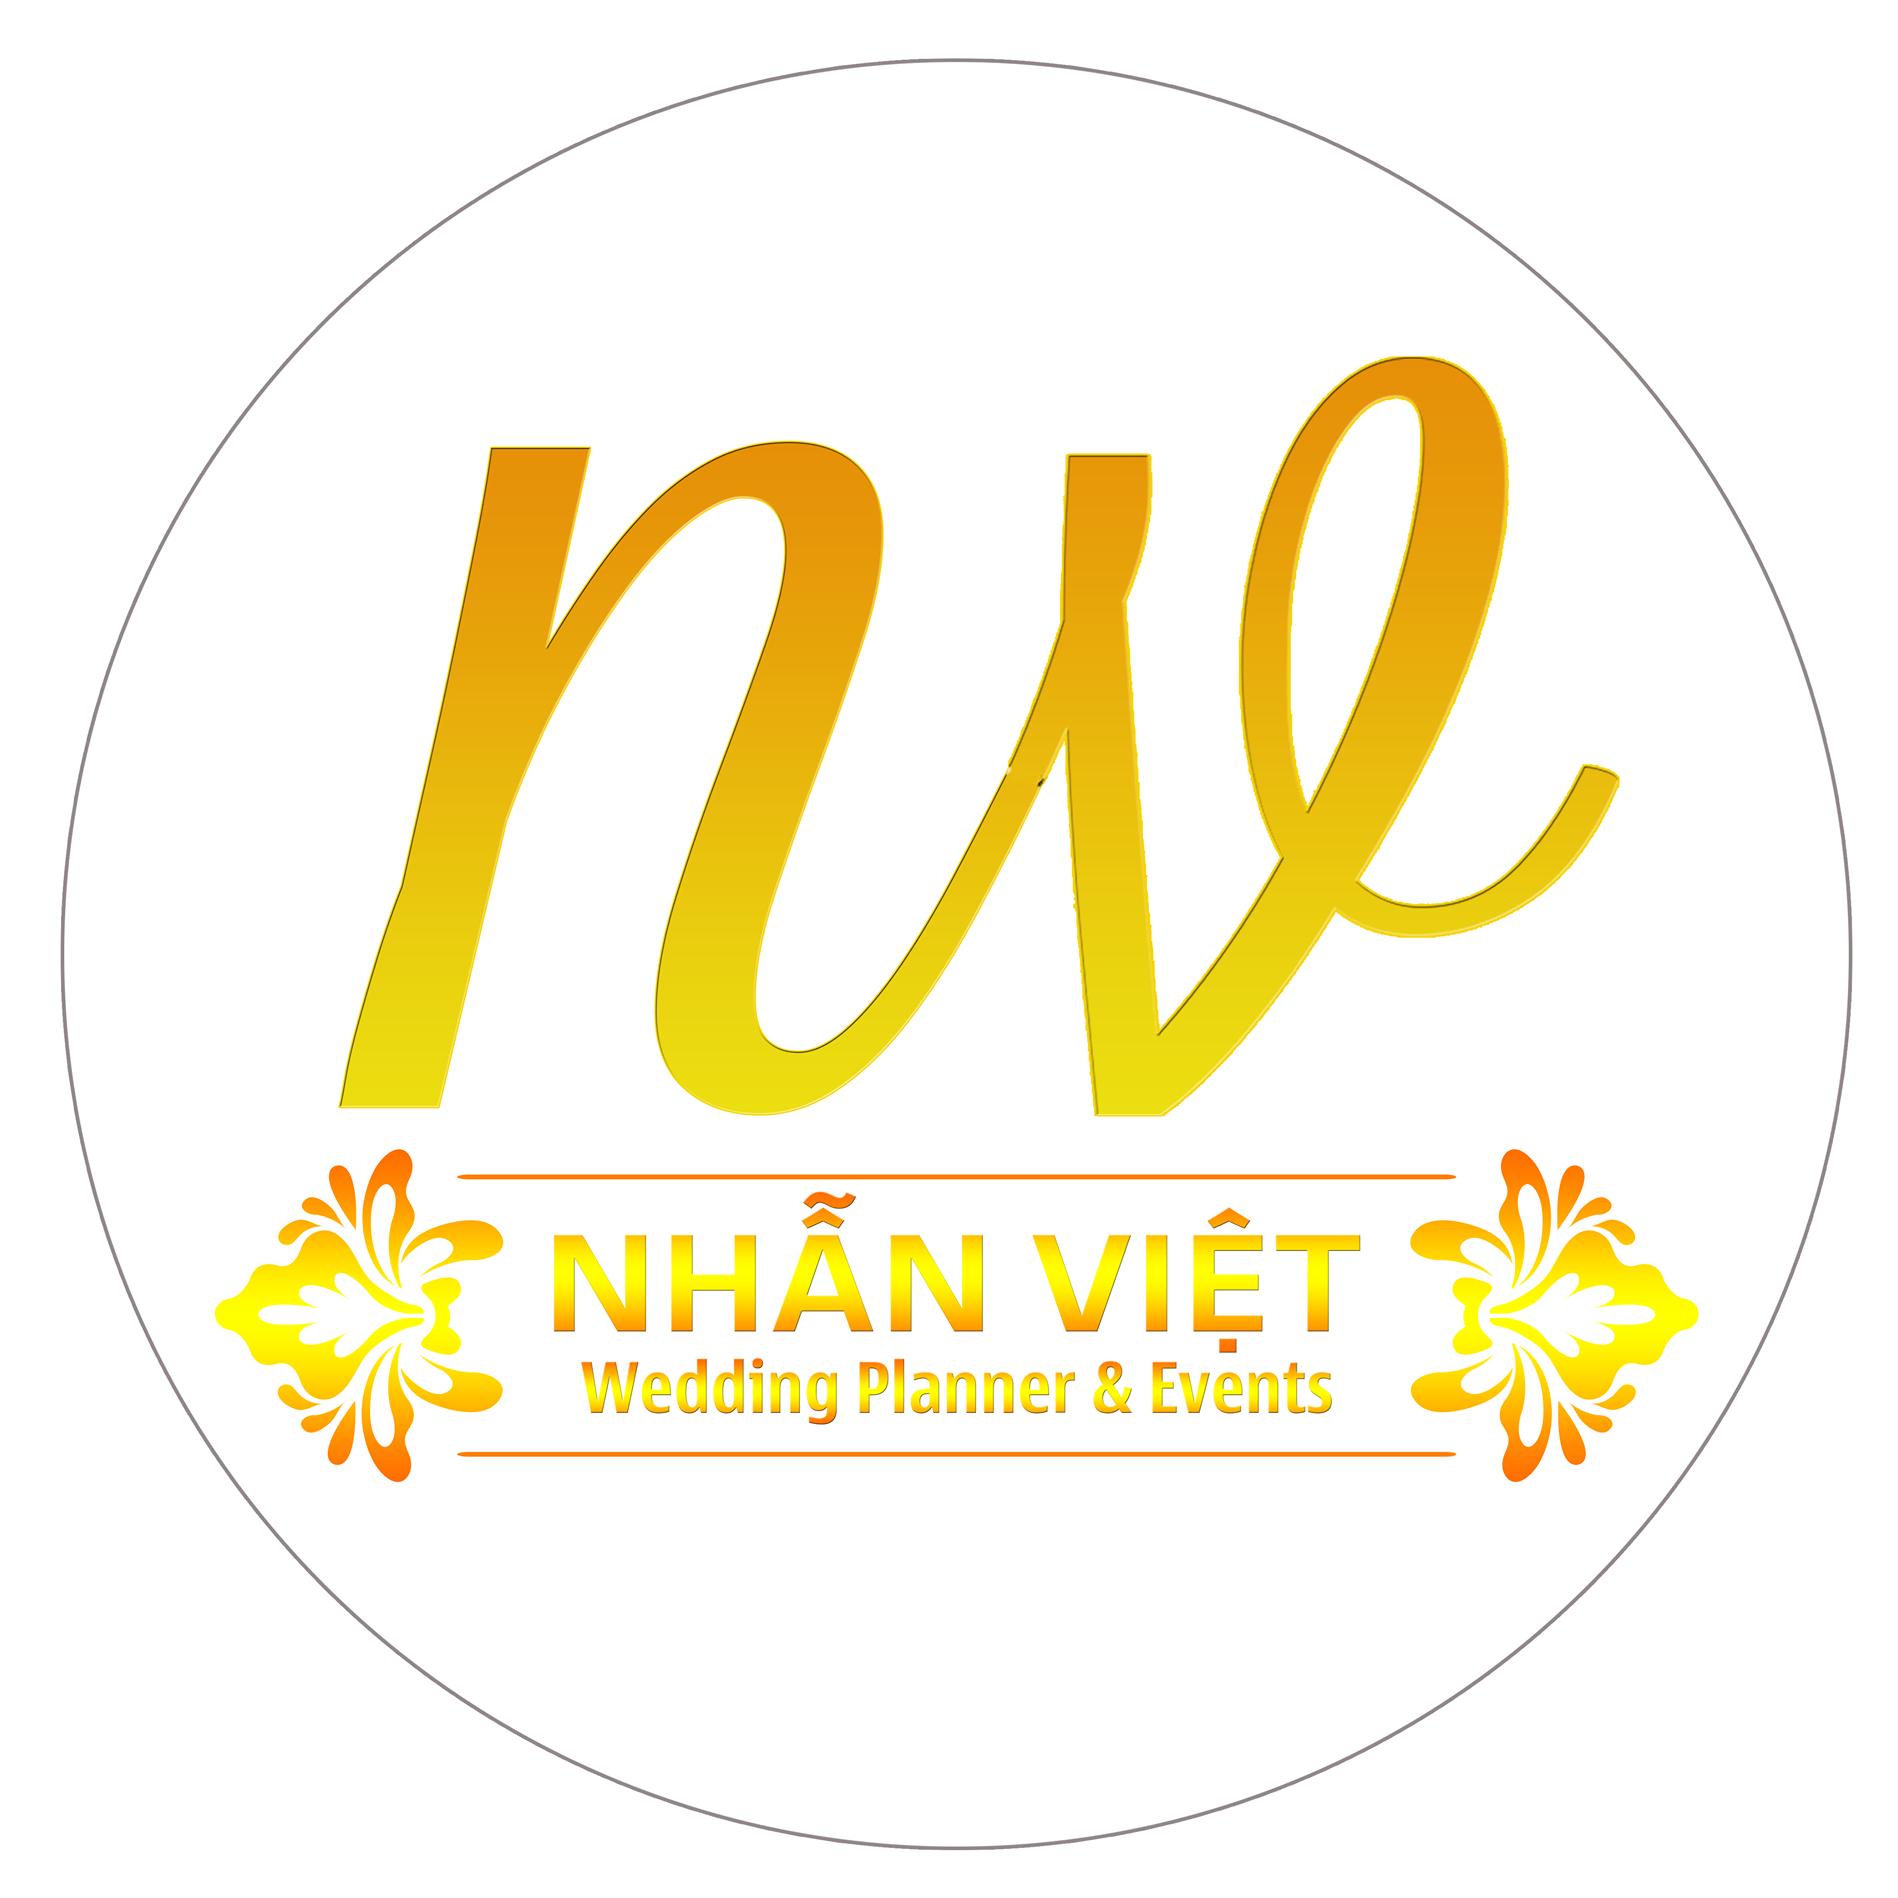 Nhẫn Việt Wedding Planner